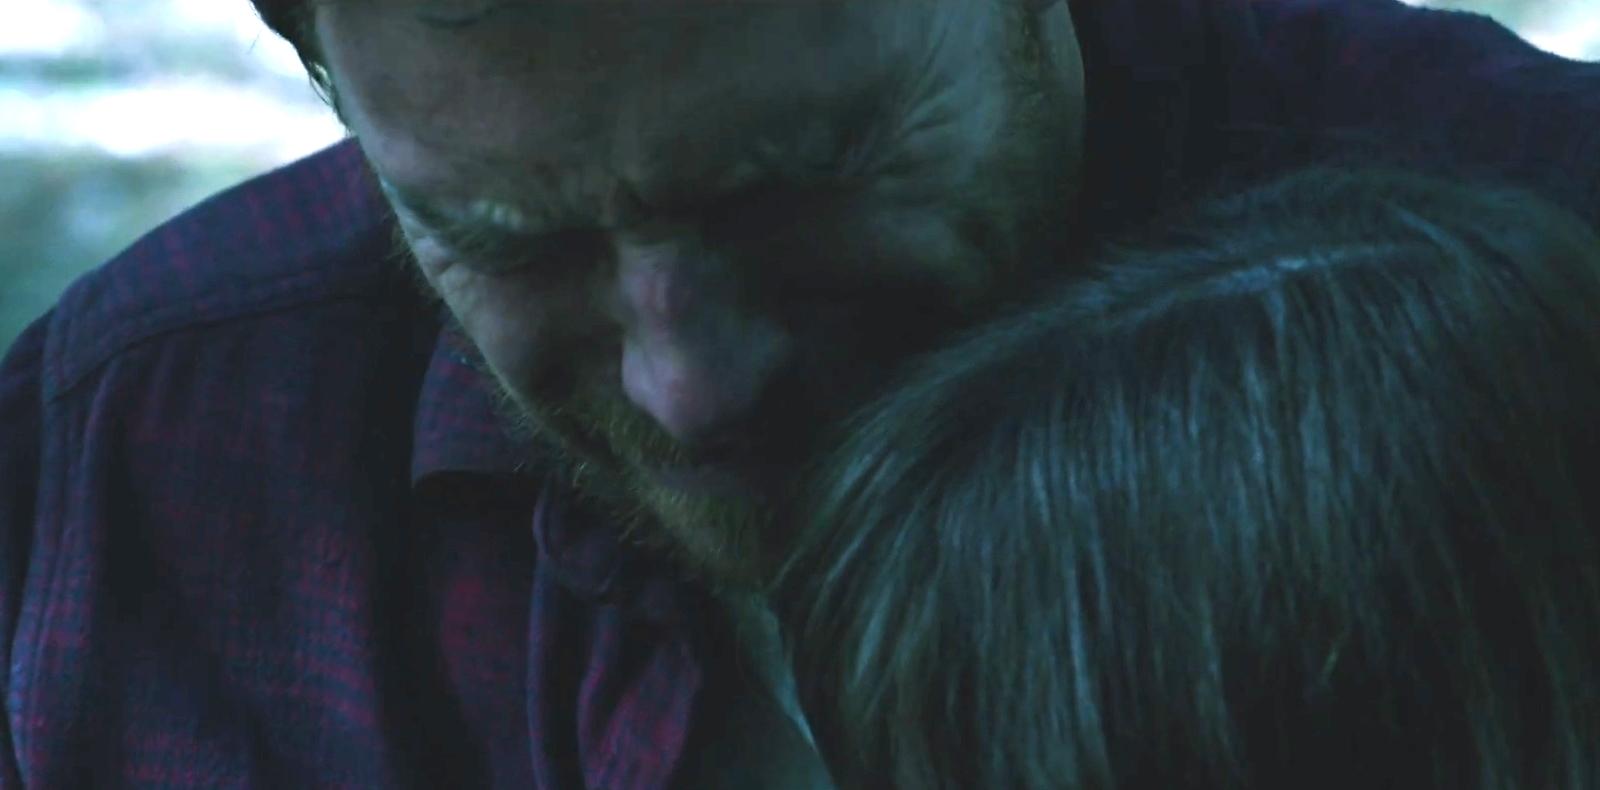 Michael Fassbender as Magneto in X-men: Apocalypse